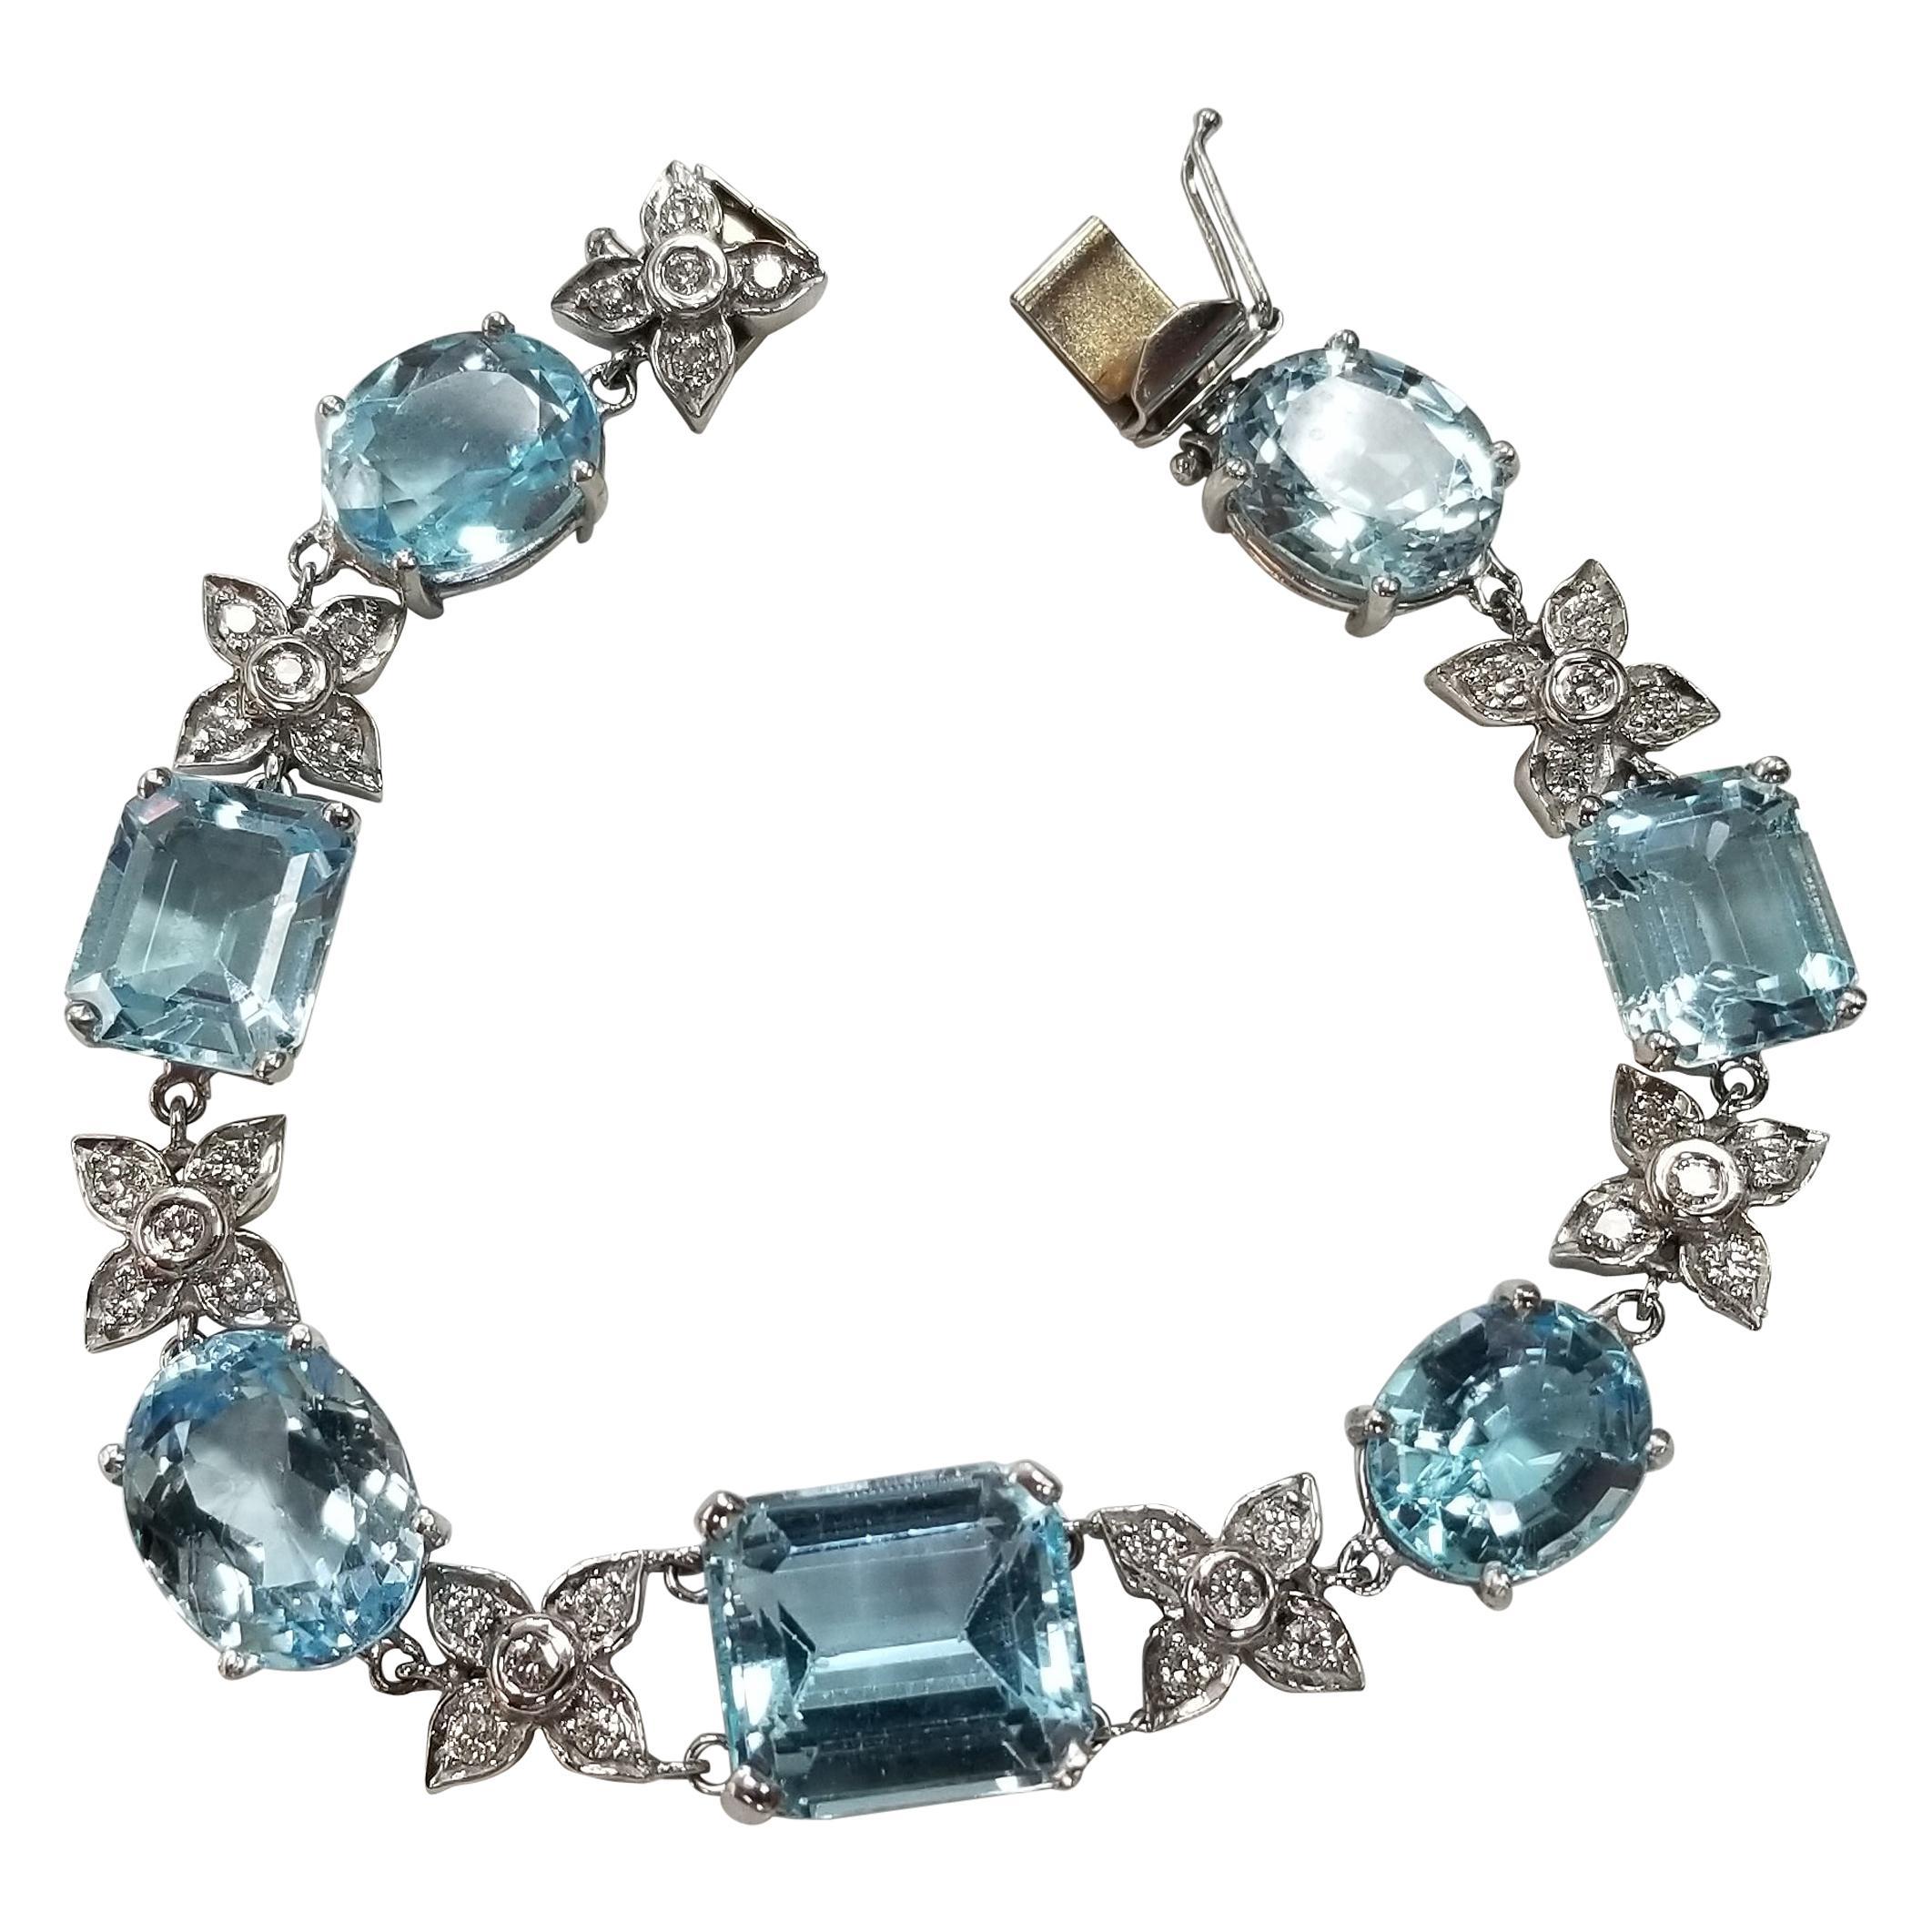 14 Karat White Gold Diamond and Blue Topaz Bracelet